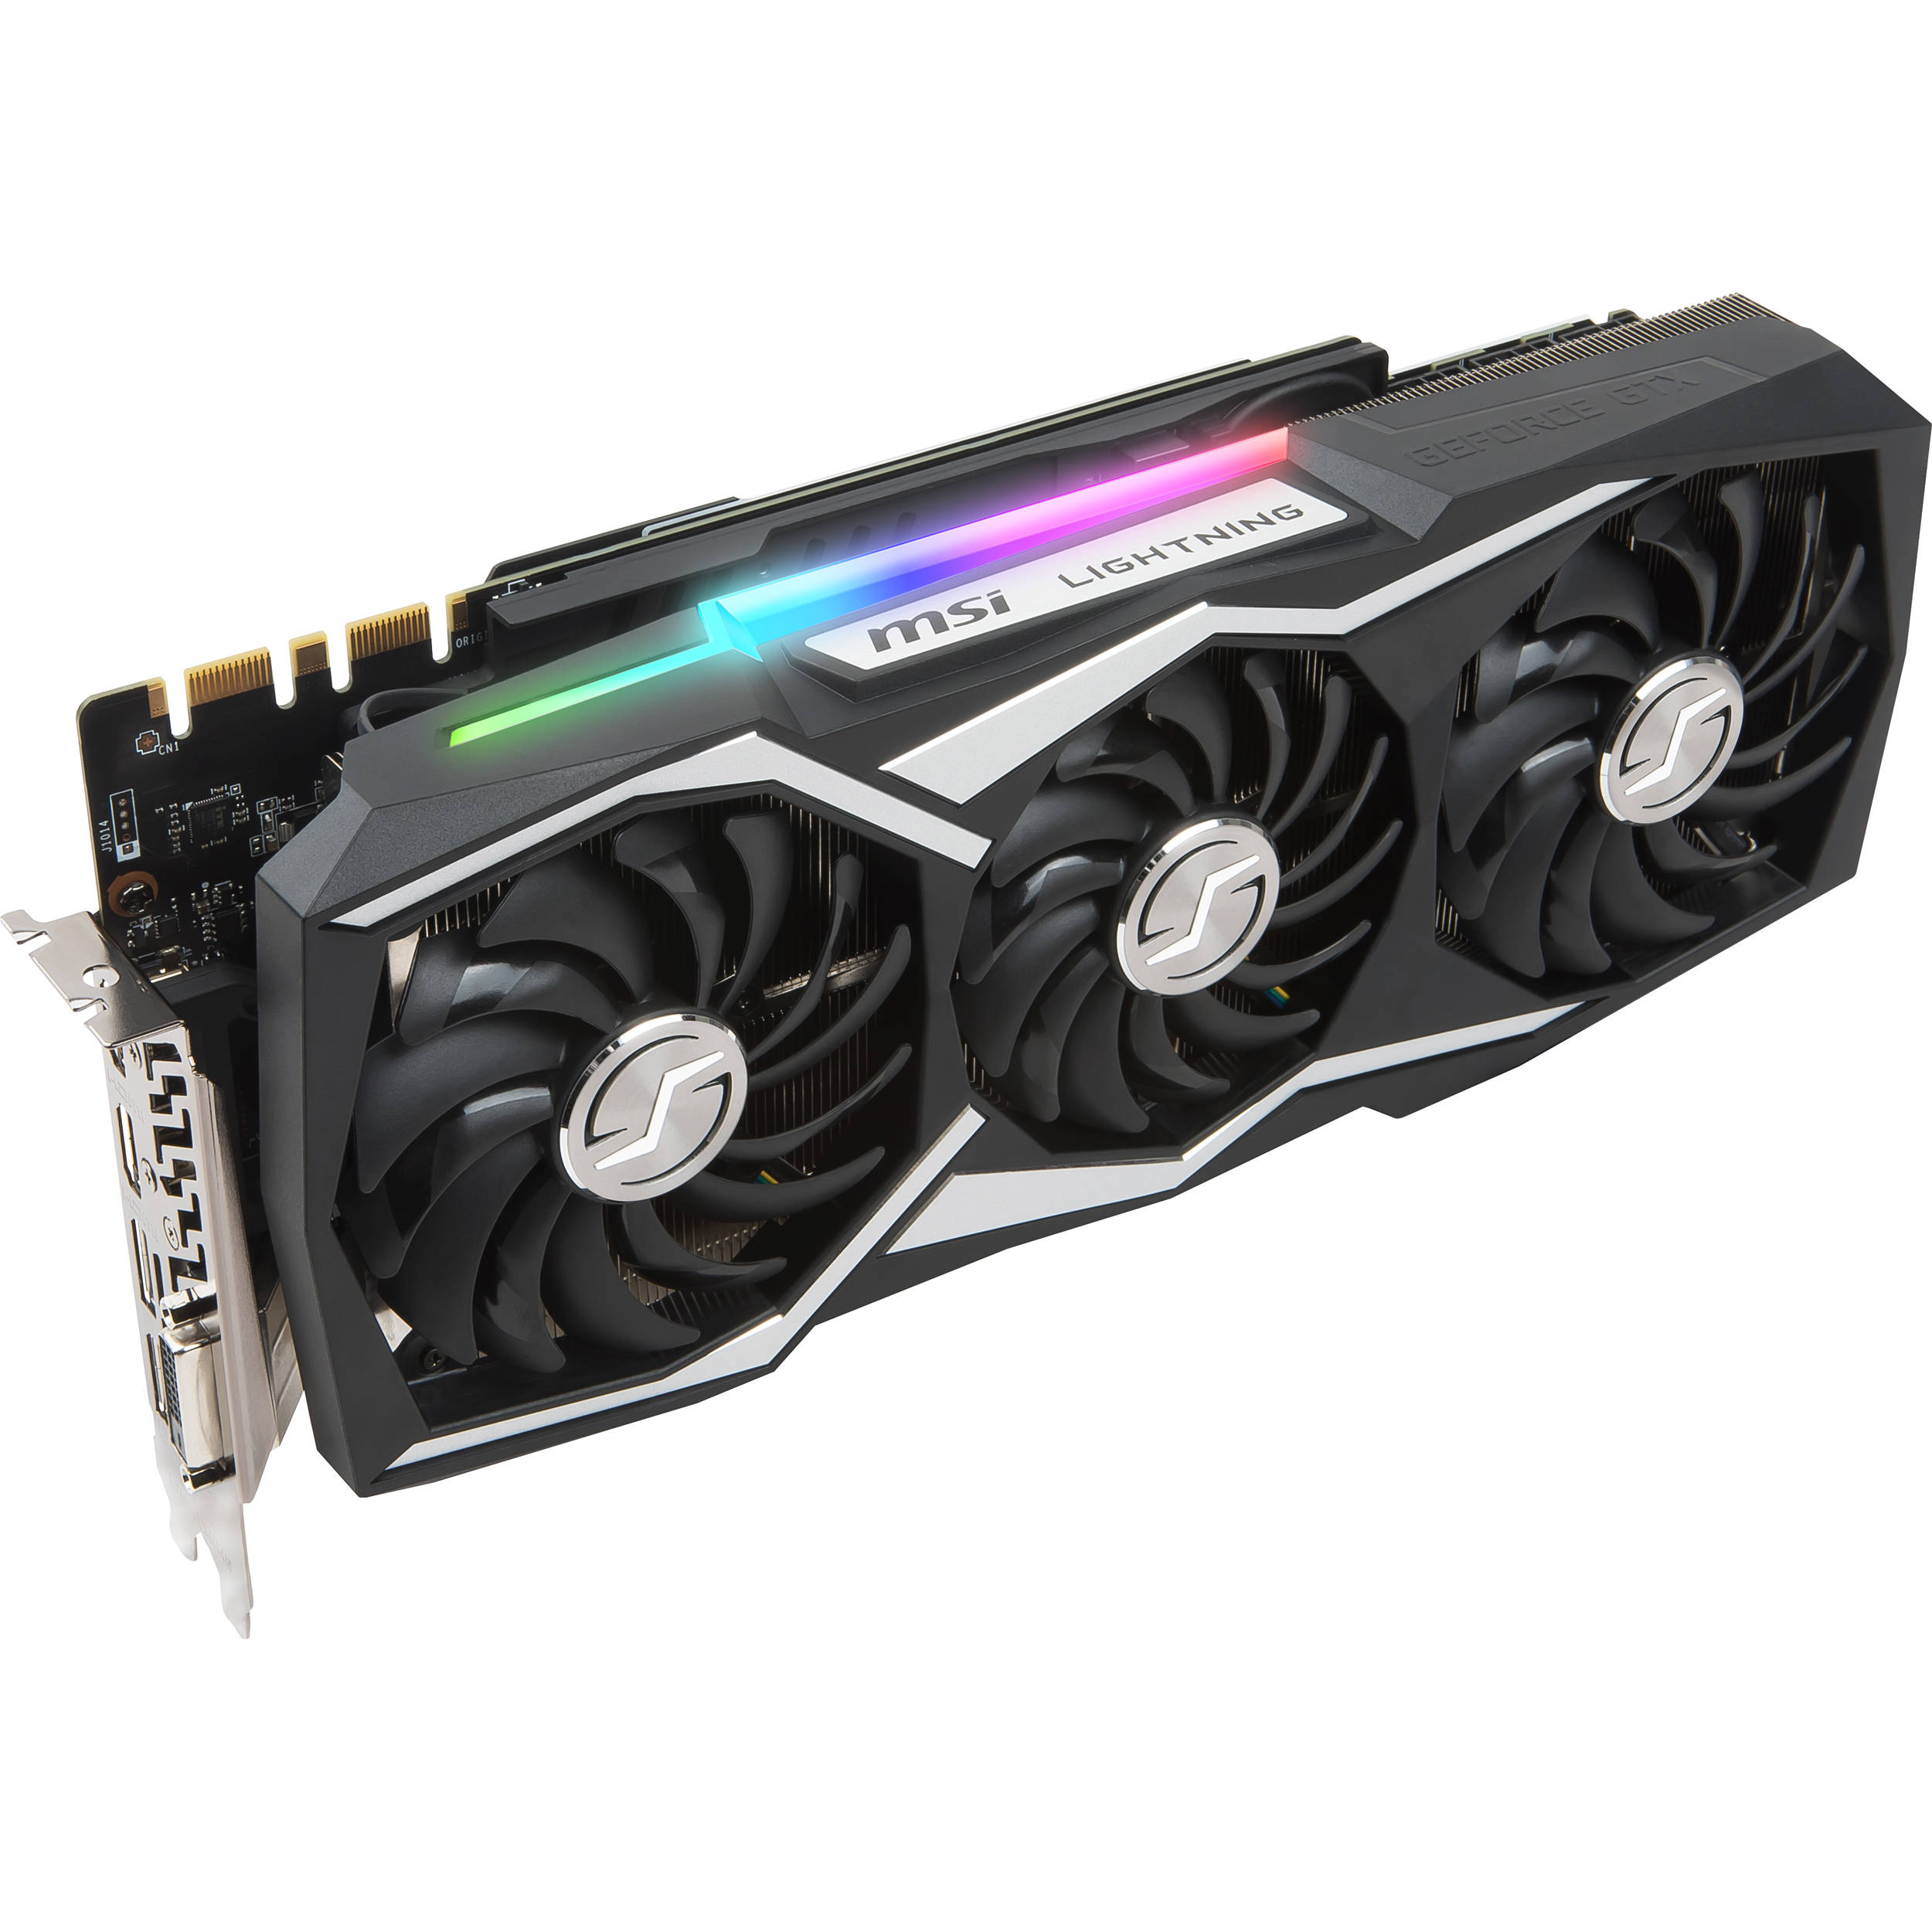 Msi Geforce Gtx 1080 Ti Lightning Z Gtx 1080 Ti Lightning